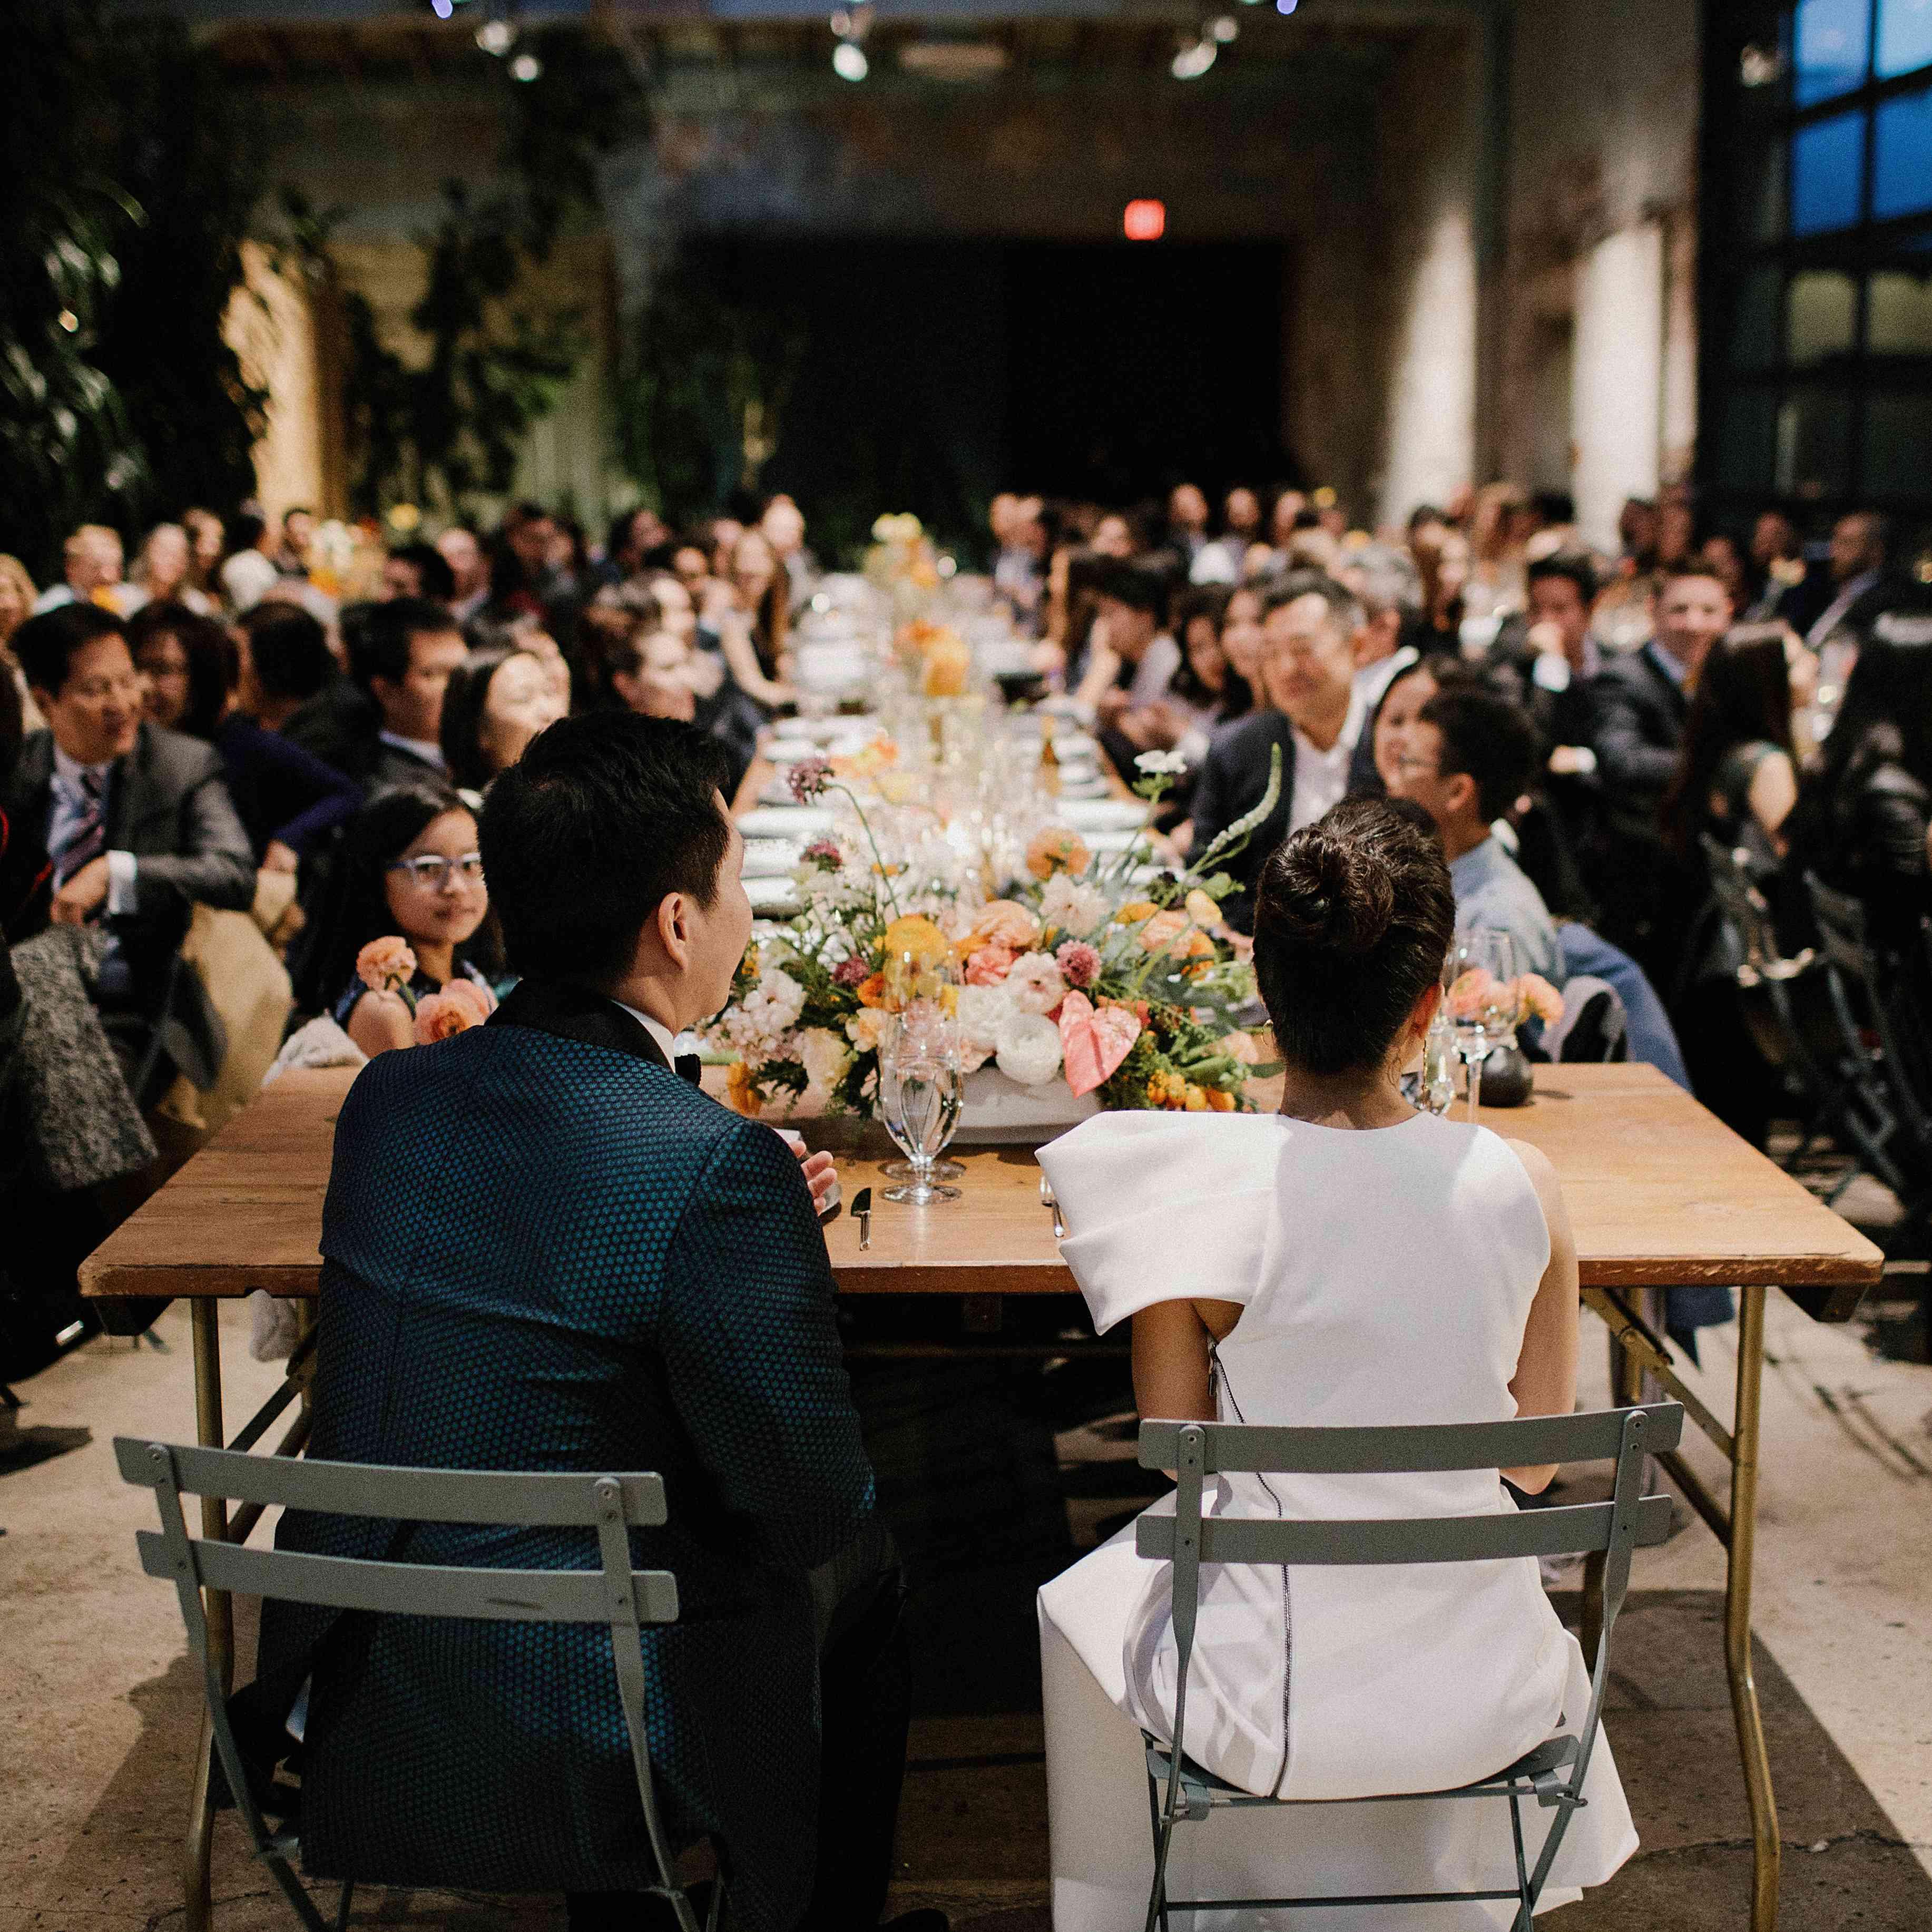 <p>Bride and groom at reception</p><br><br>